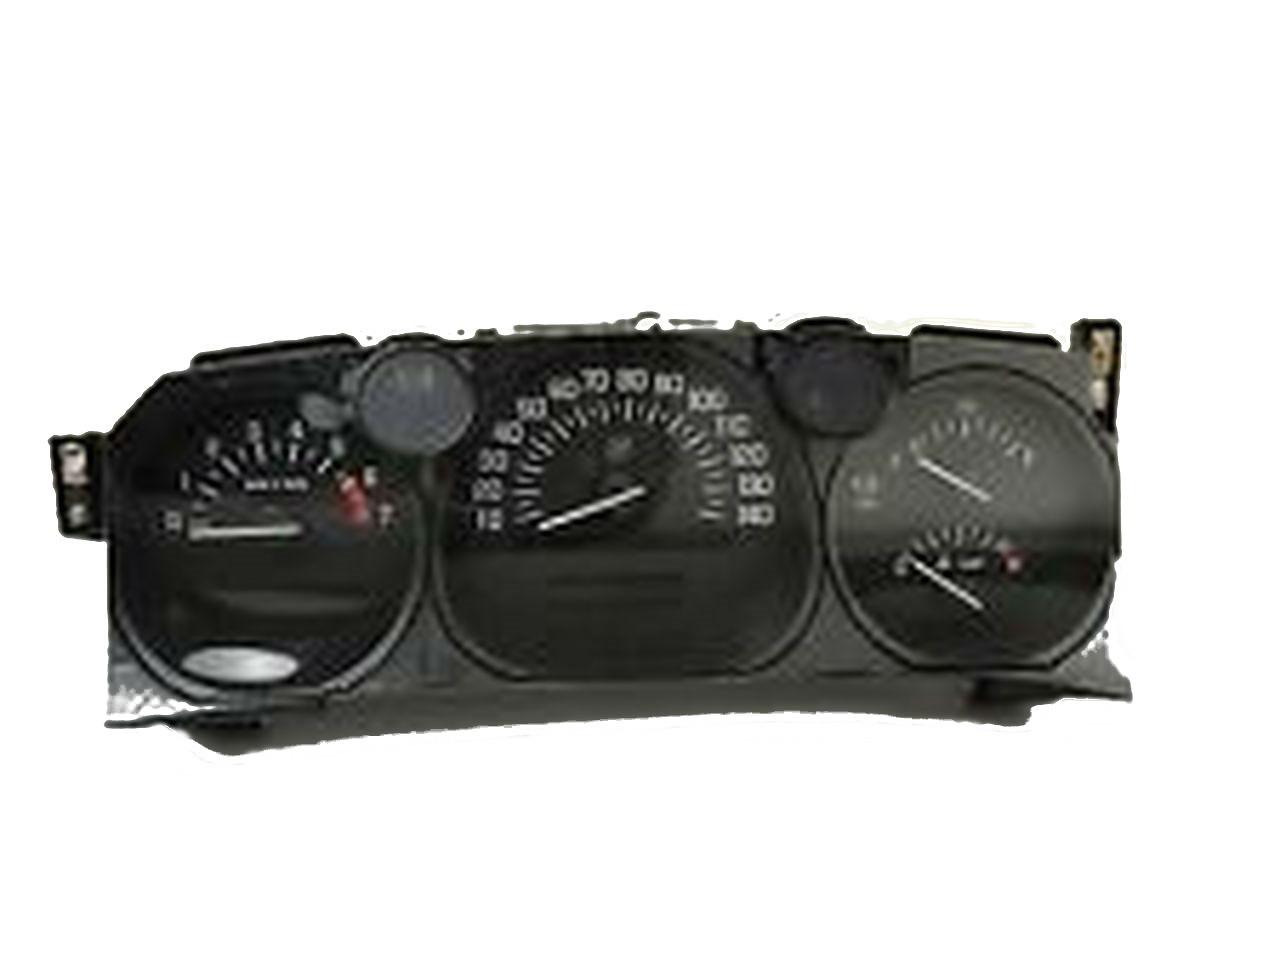 2004 BUICK LESABRE Speedometer Instrument Gauge Cluster IPC Repair Service